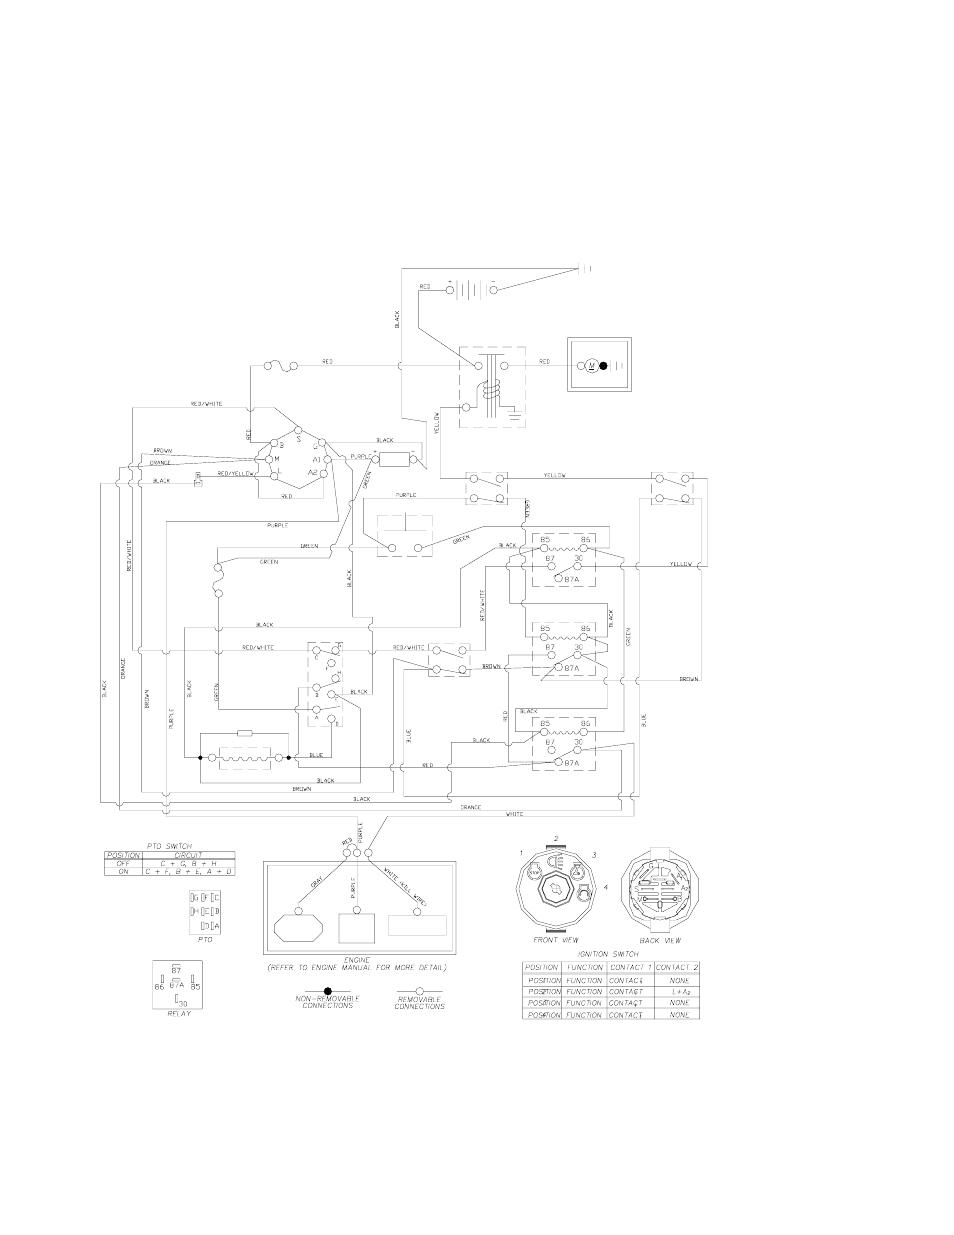 yazoo ignition switch wiring diagram wiring diagrams  yazoo ignition switch wiring diagram #1